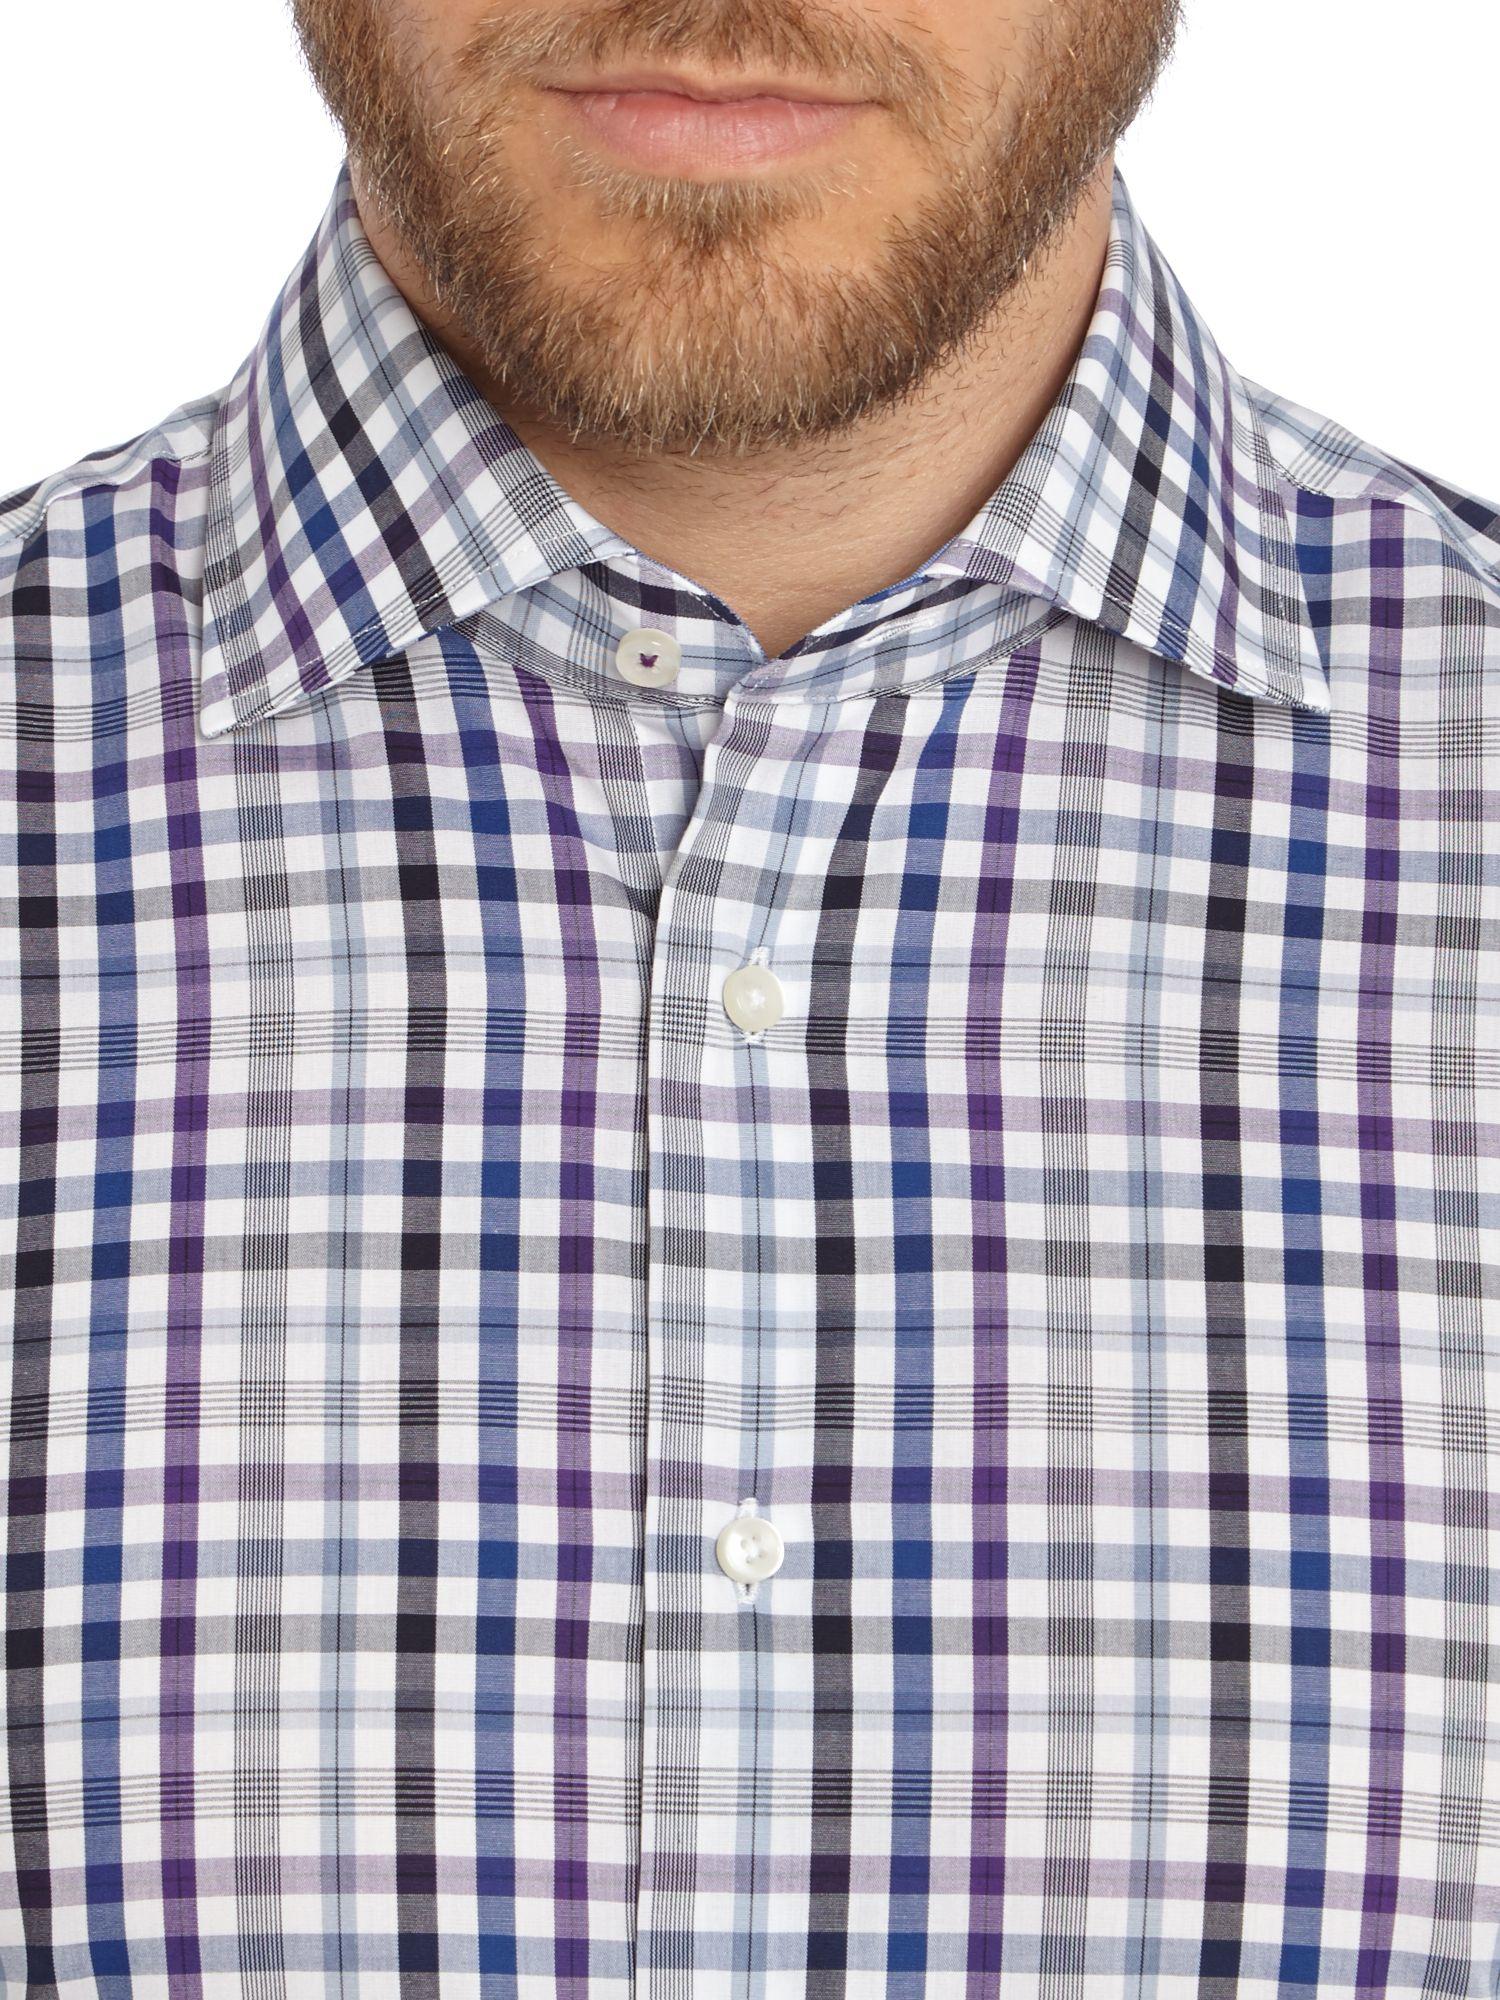 Lyst tommy hilfiger jake slim fit check shirt in blue for Slim fit check shirt